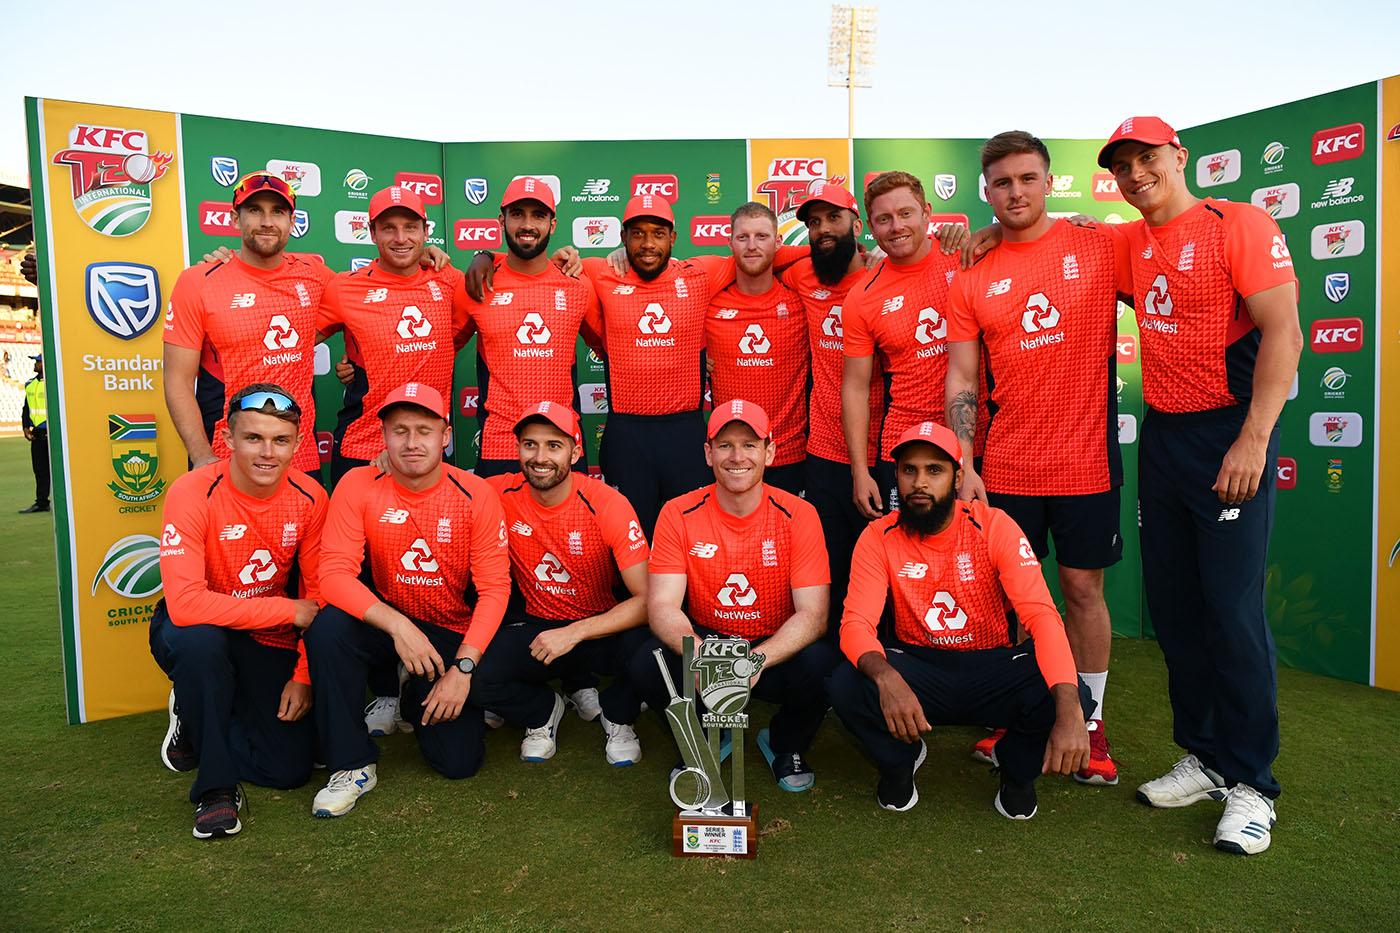 Chris Jordan, Dawid Malan Back In England Squad For Pakistan T20Is